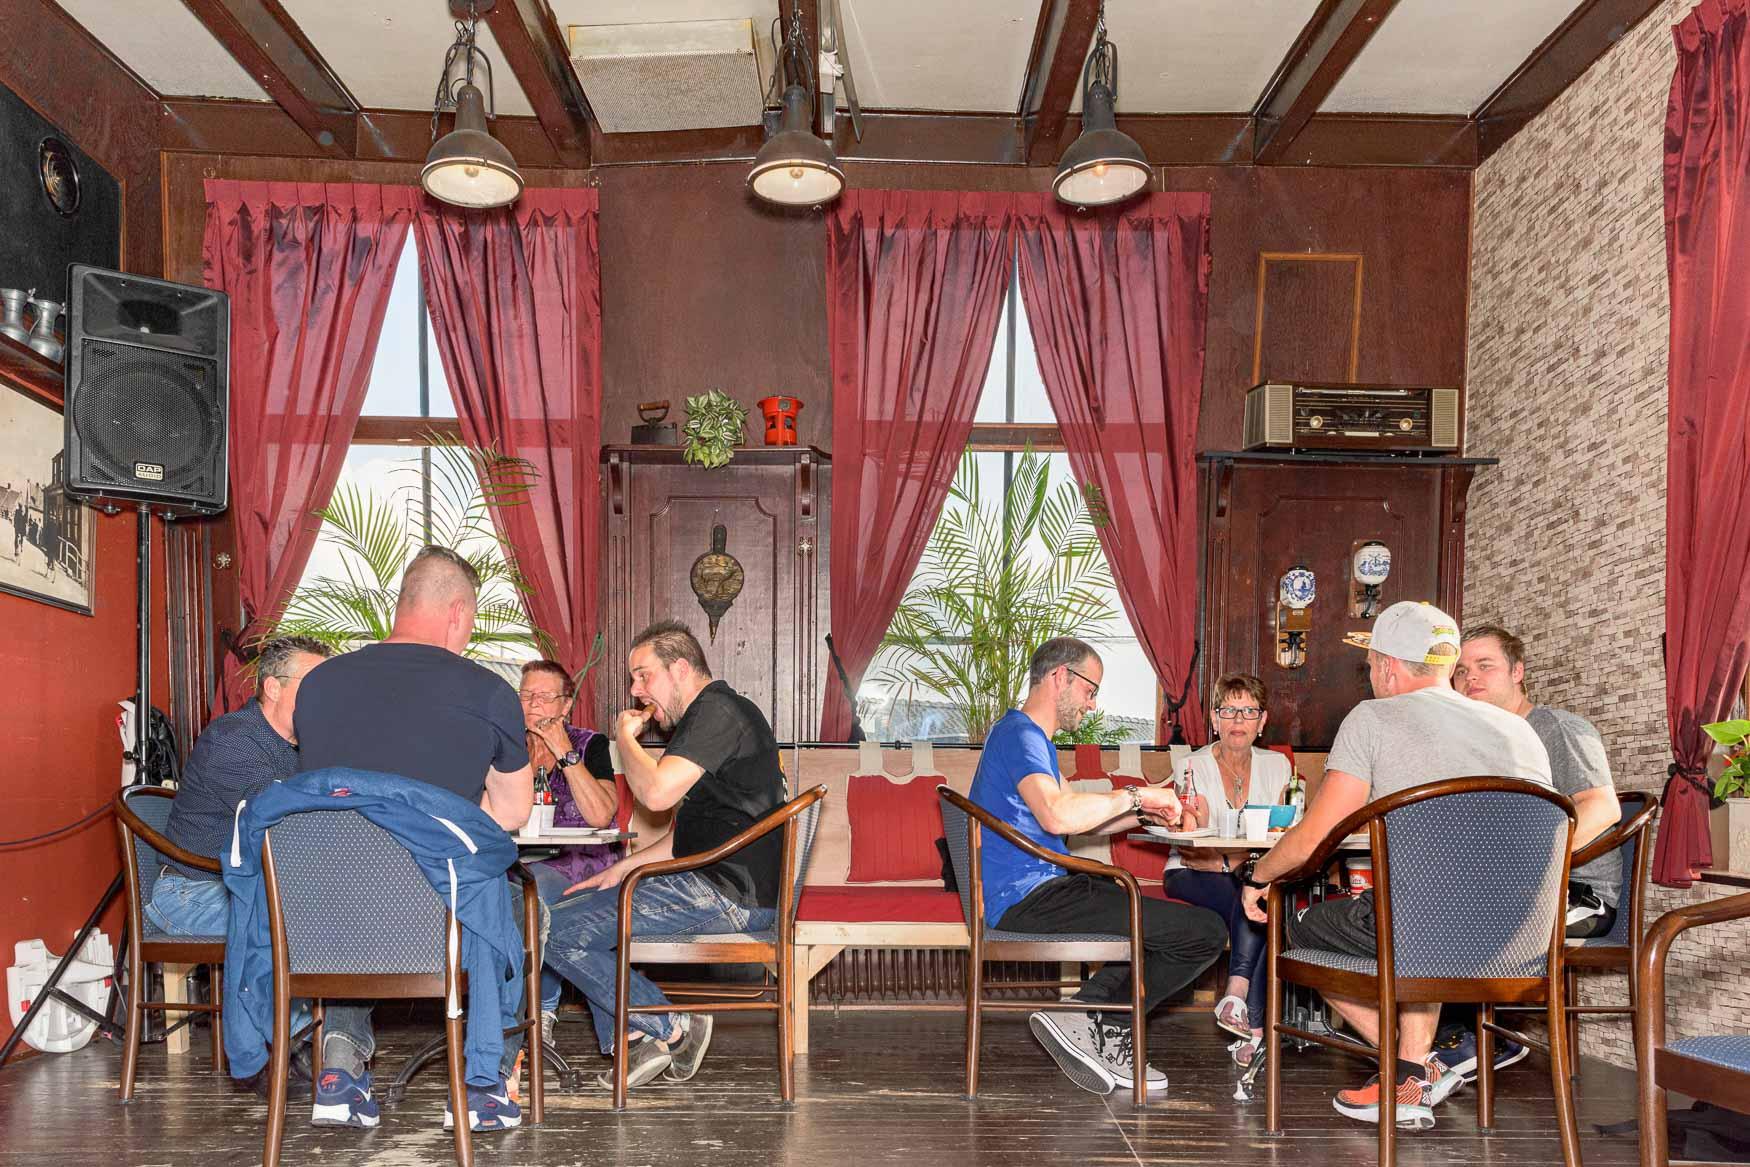 7e frikandellen eetwedstrijd in Cafe Vrouwenhemel te Werkendam | Sas Schilten Fotografie